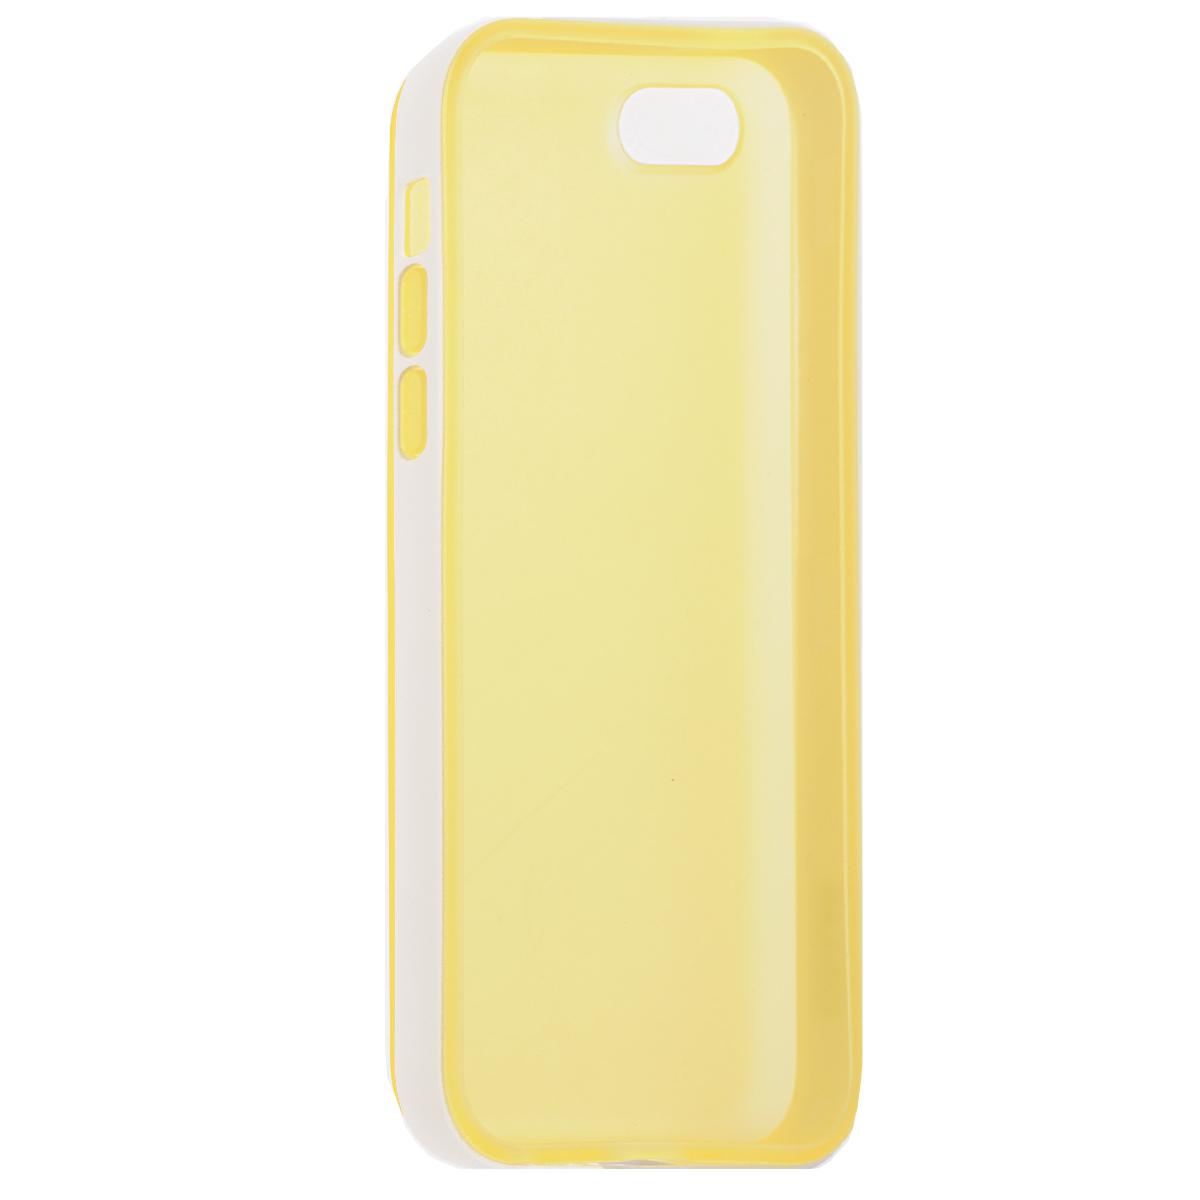 Gissar Scene чехол для Apple iPhone 5c, Yellow